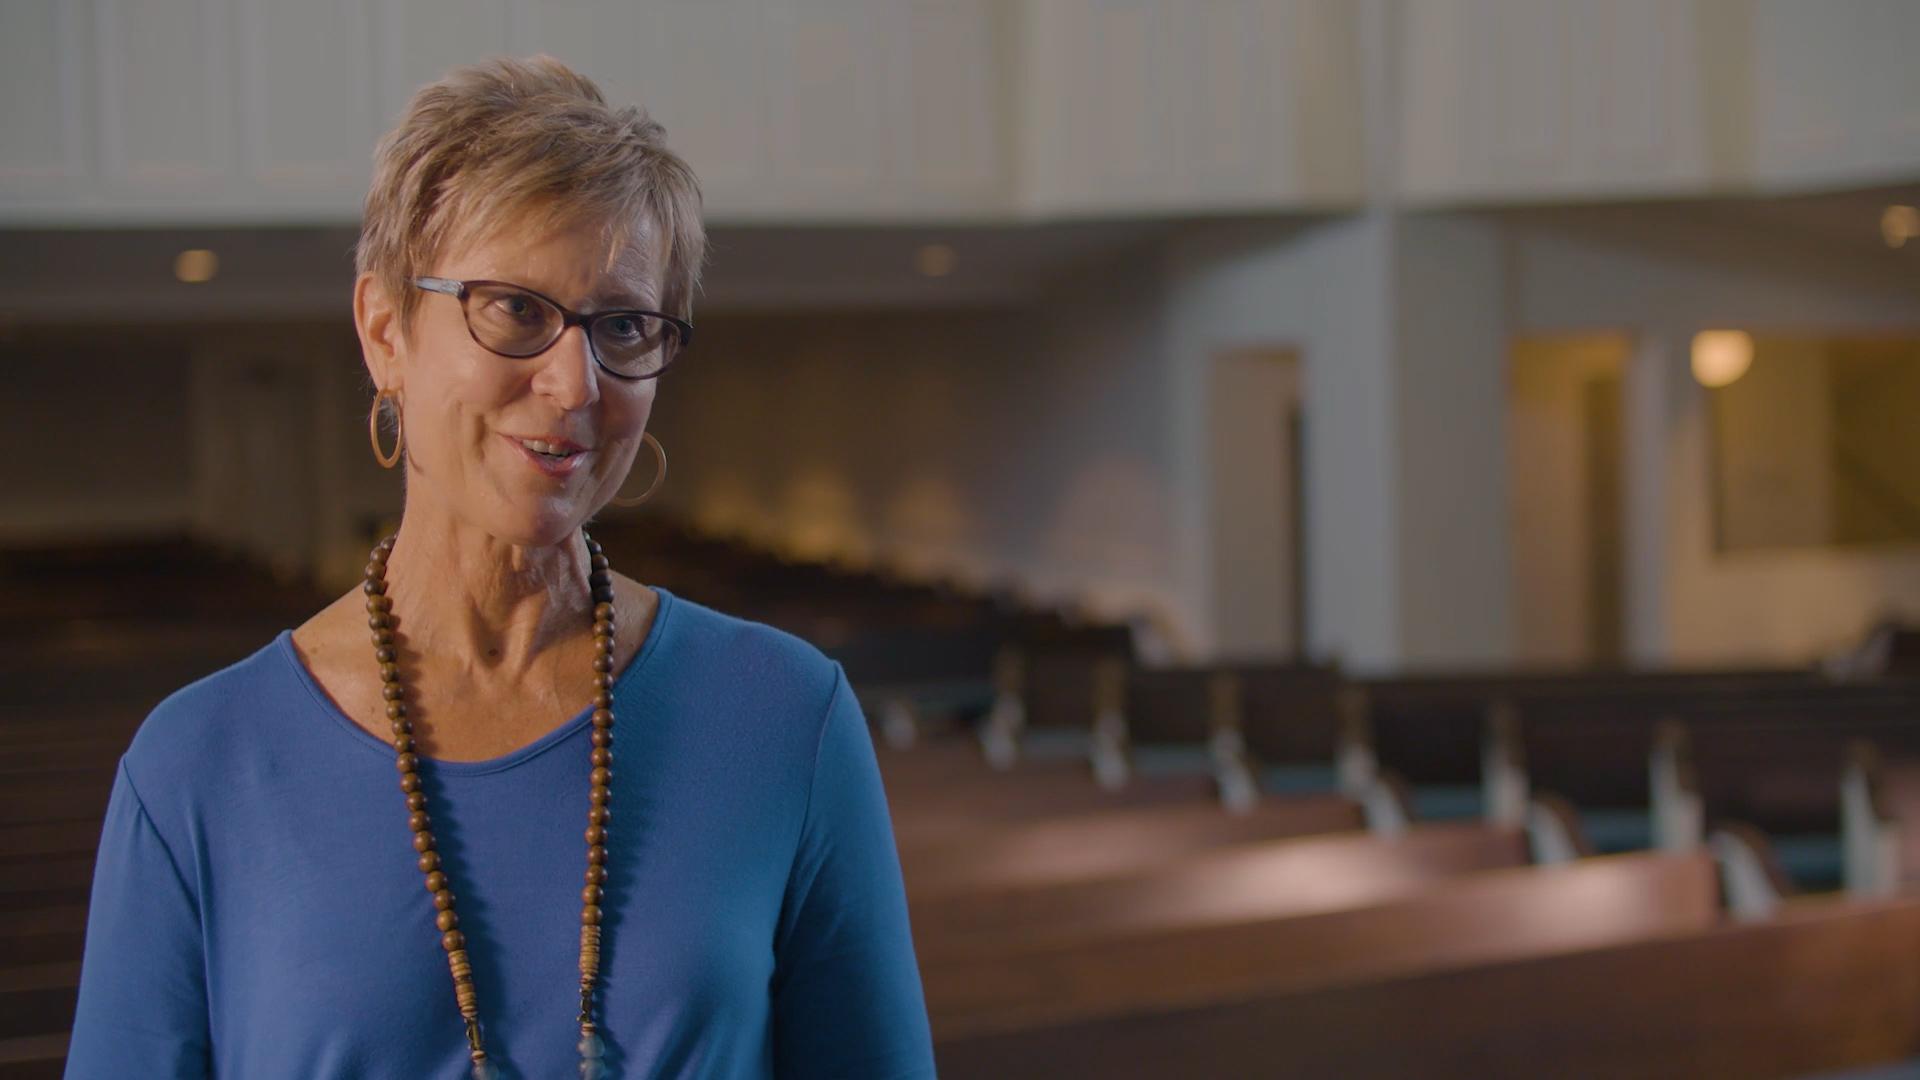 Kathy Dority